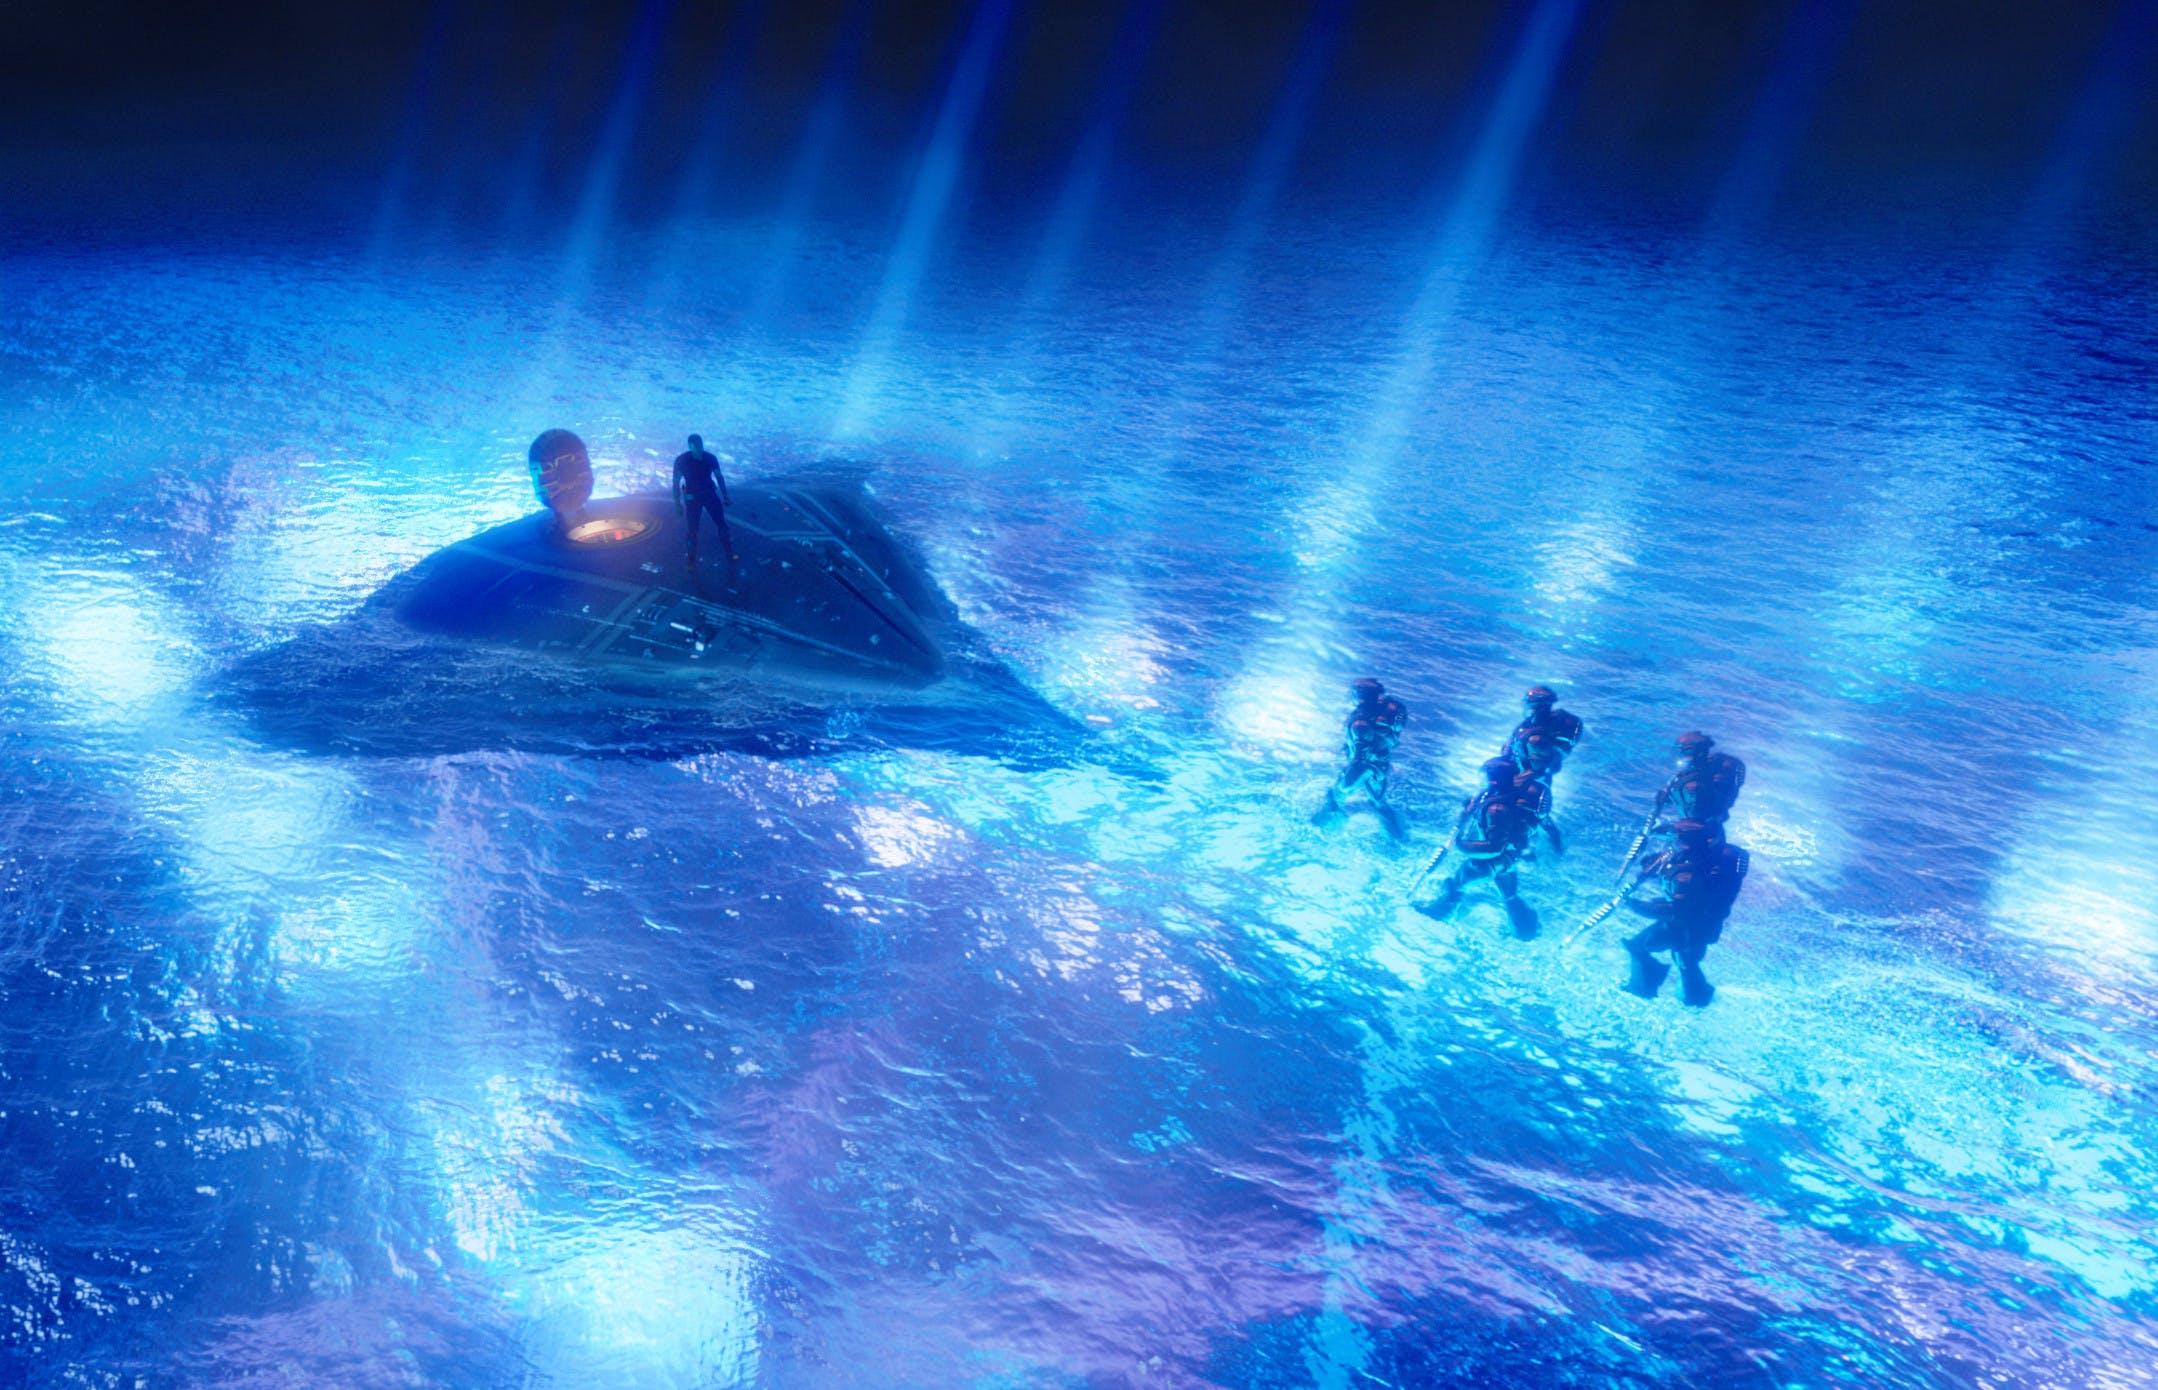 Scanline VFX. Render Farm. Aquaman. Cloud Rendering.